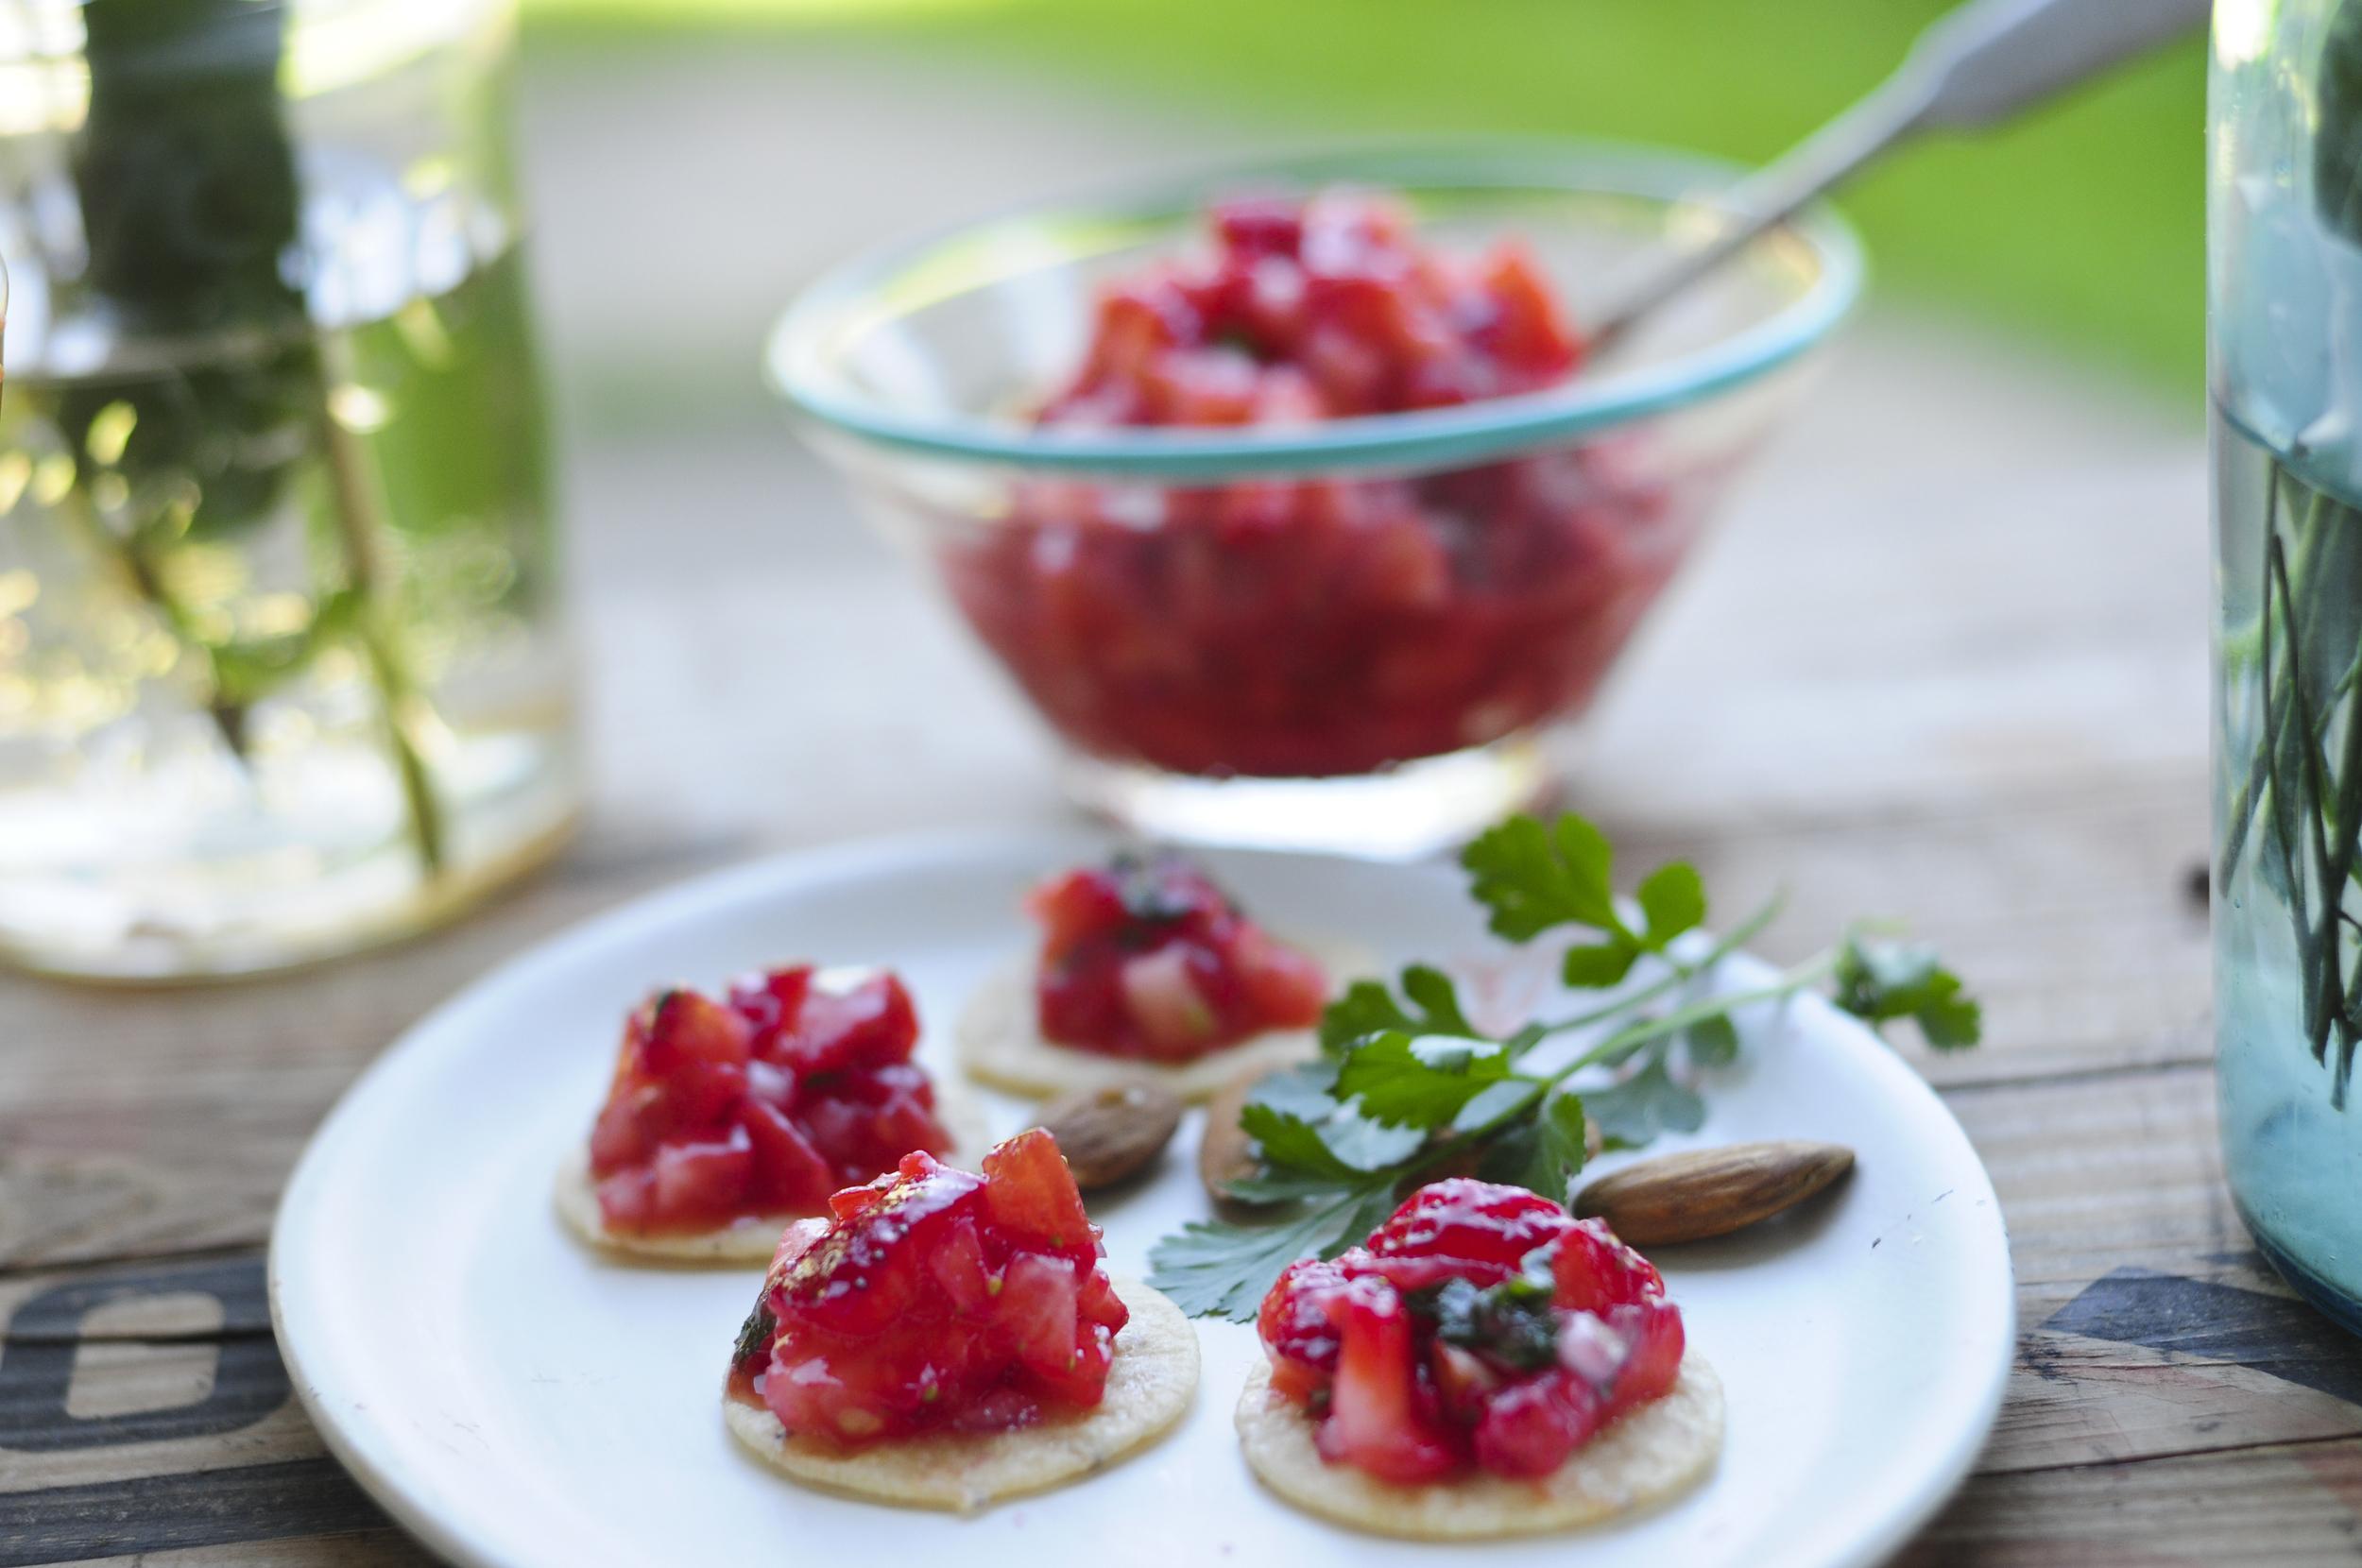 a.big.strawberry.tomato.salsa.craker.forest.food.DSC_9037.jpg